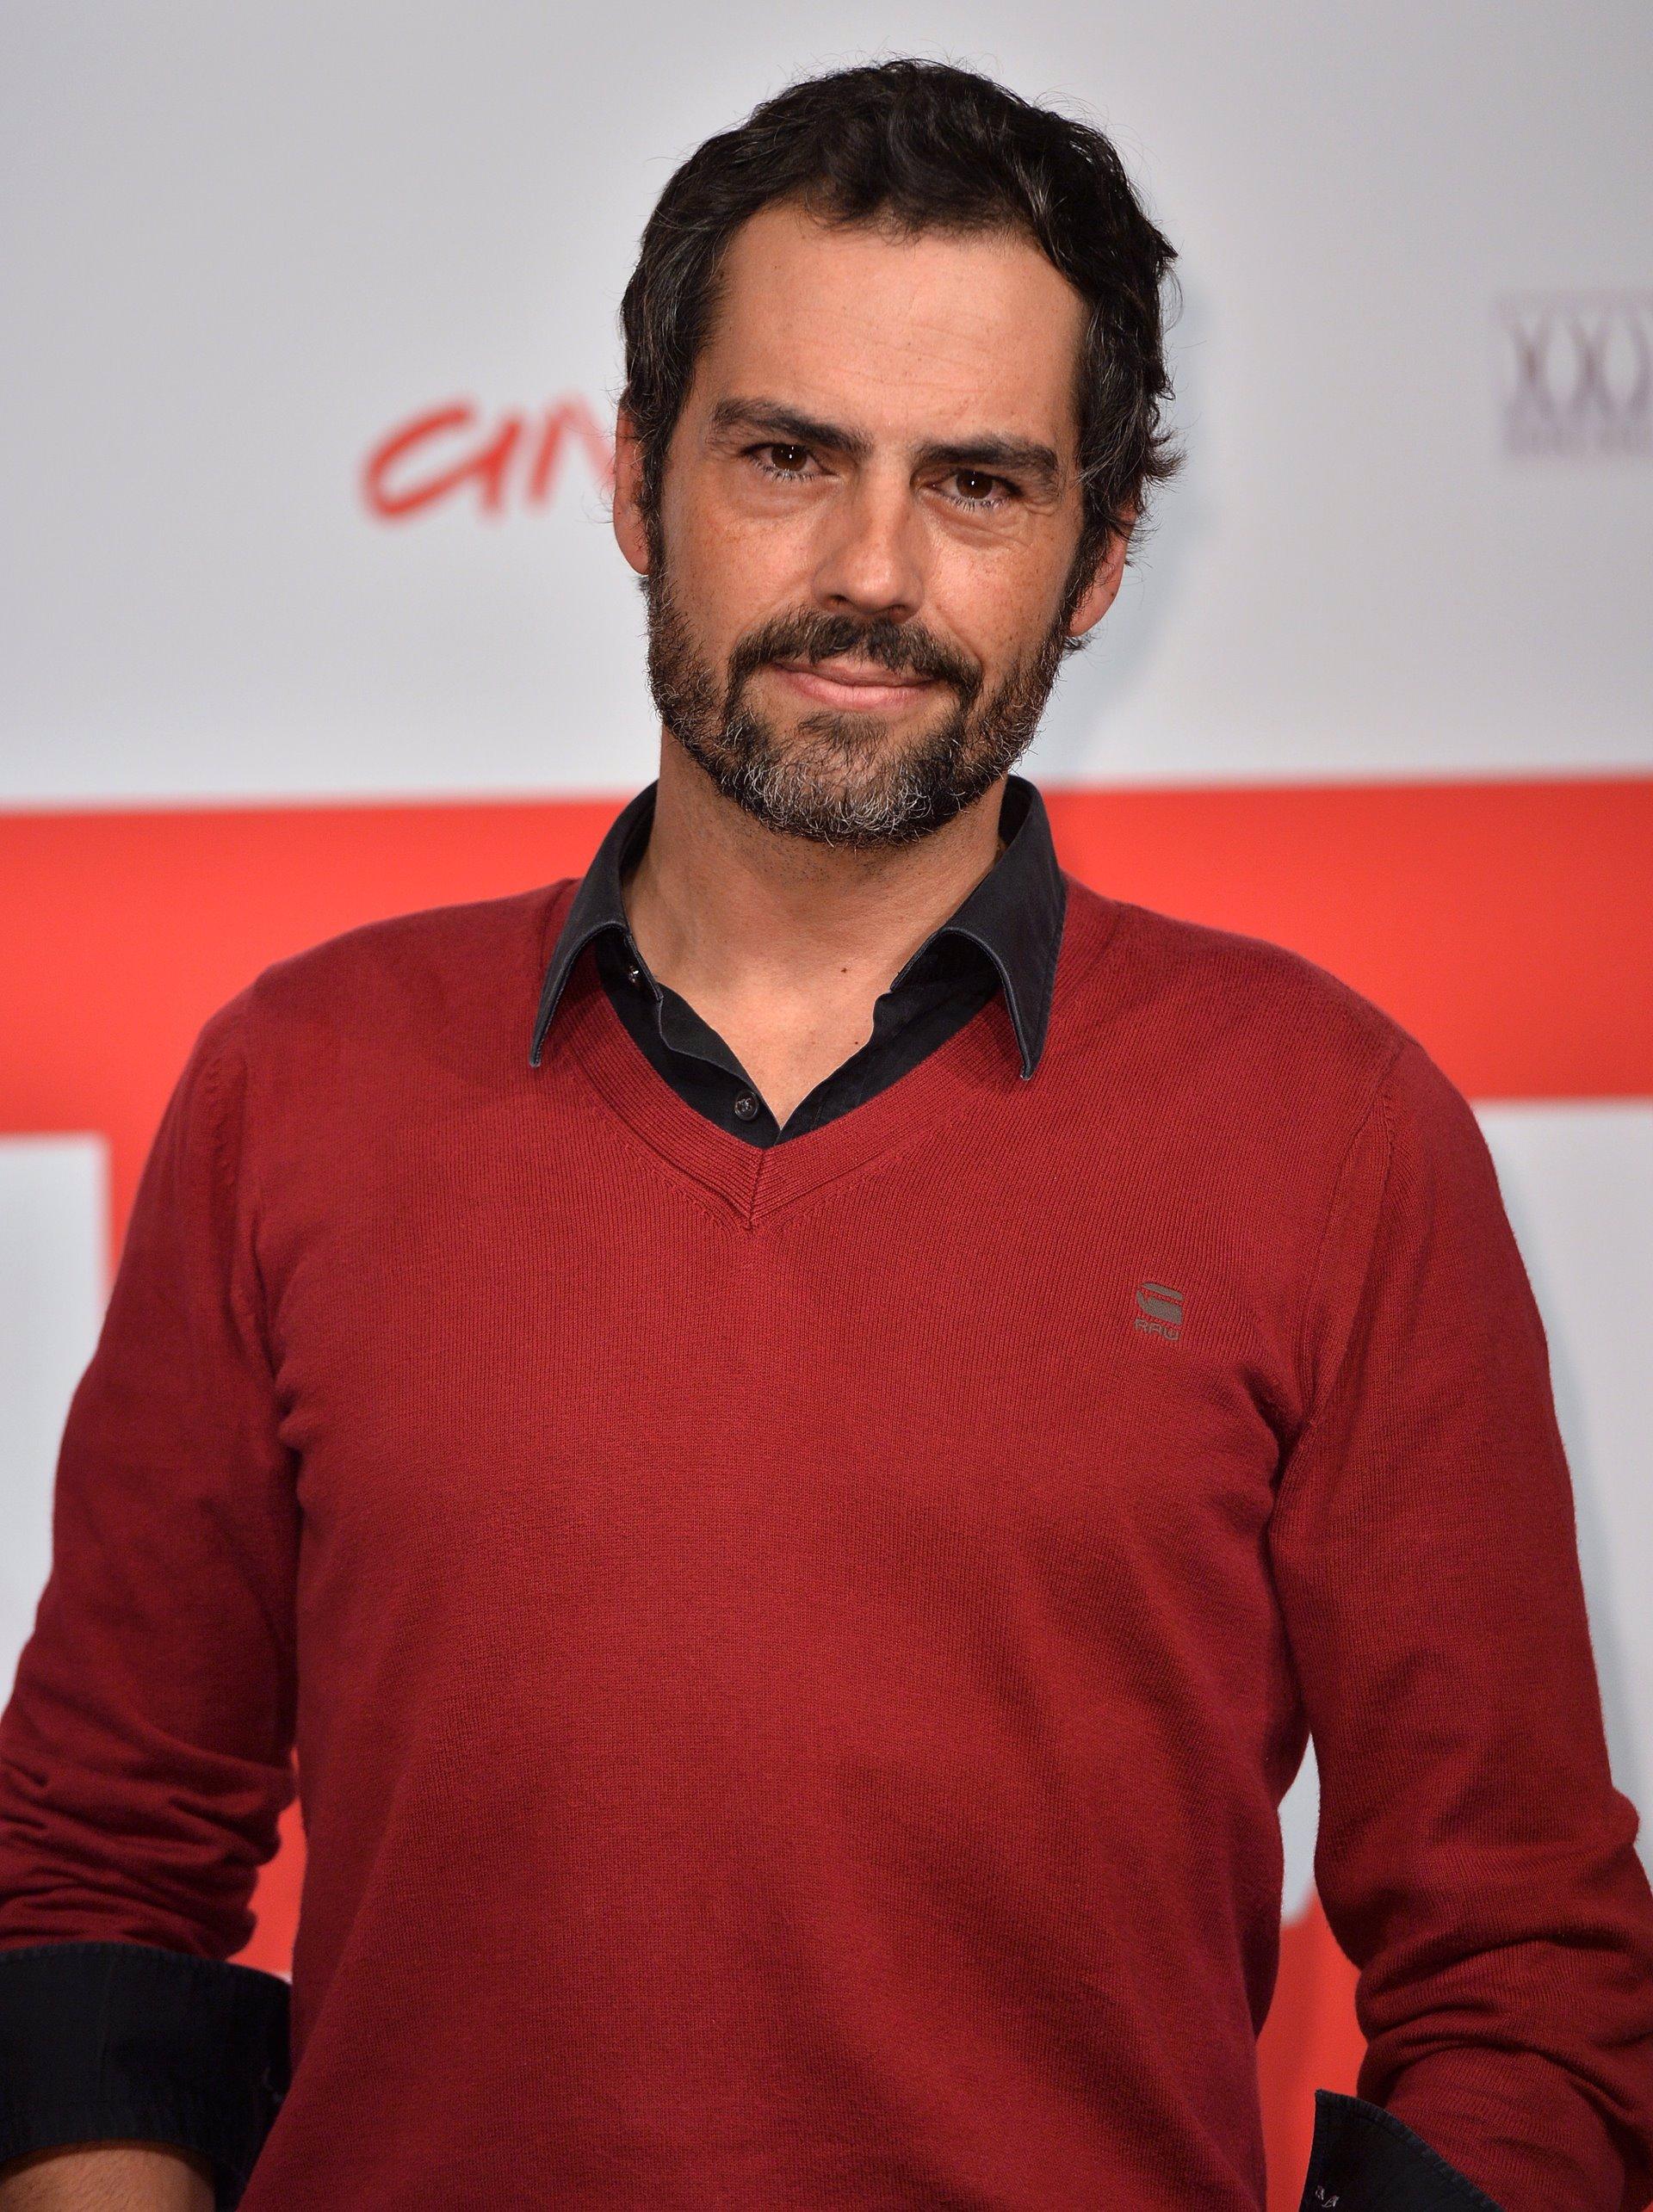 Filipe Duarte